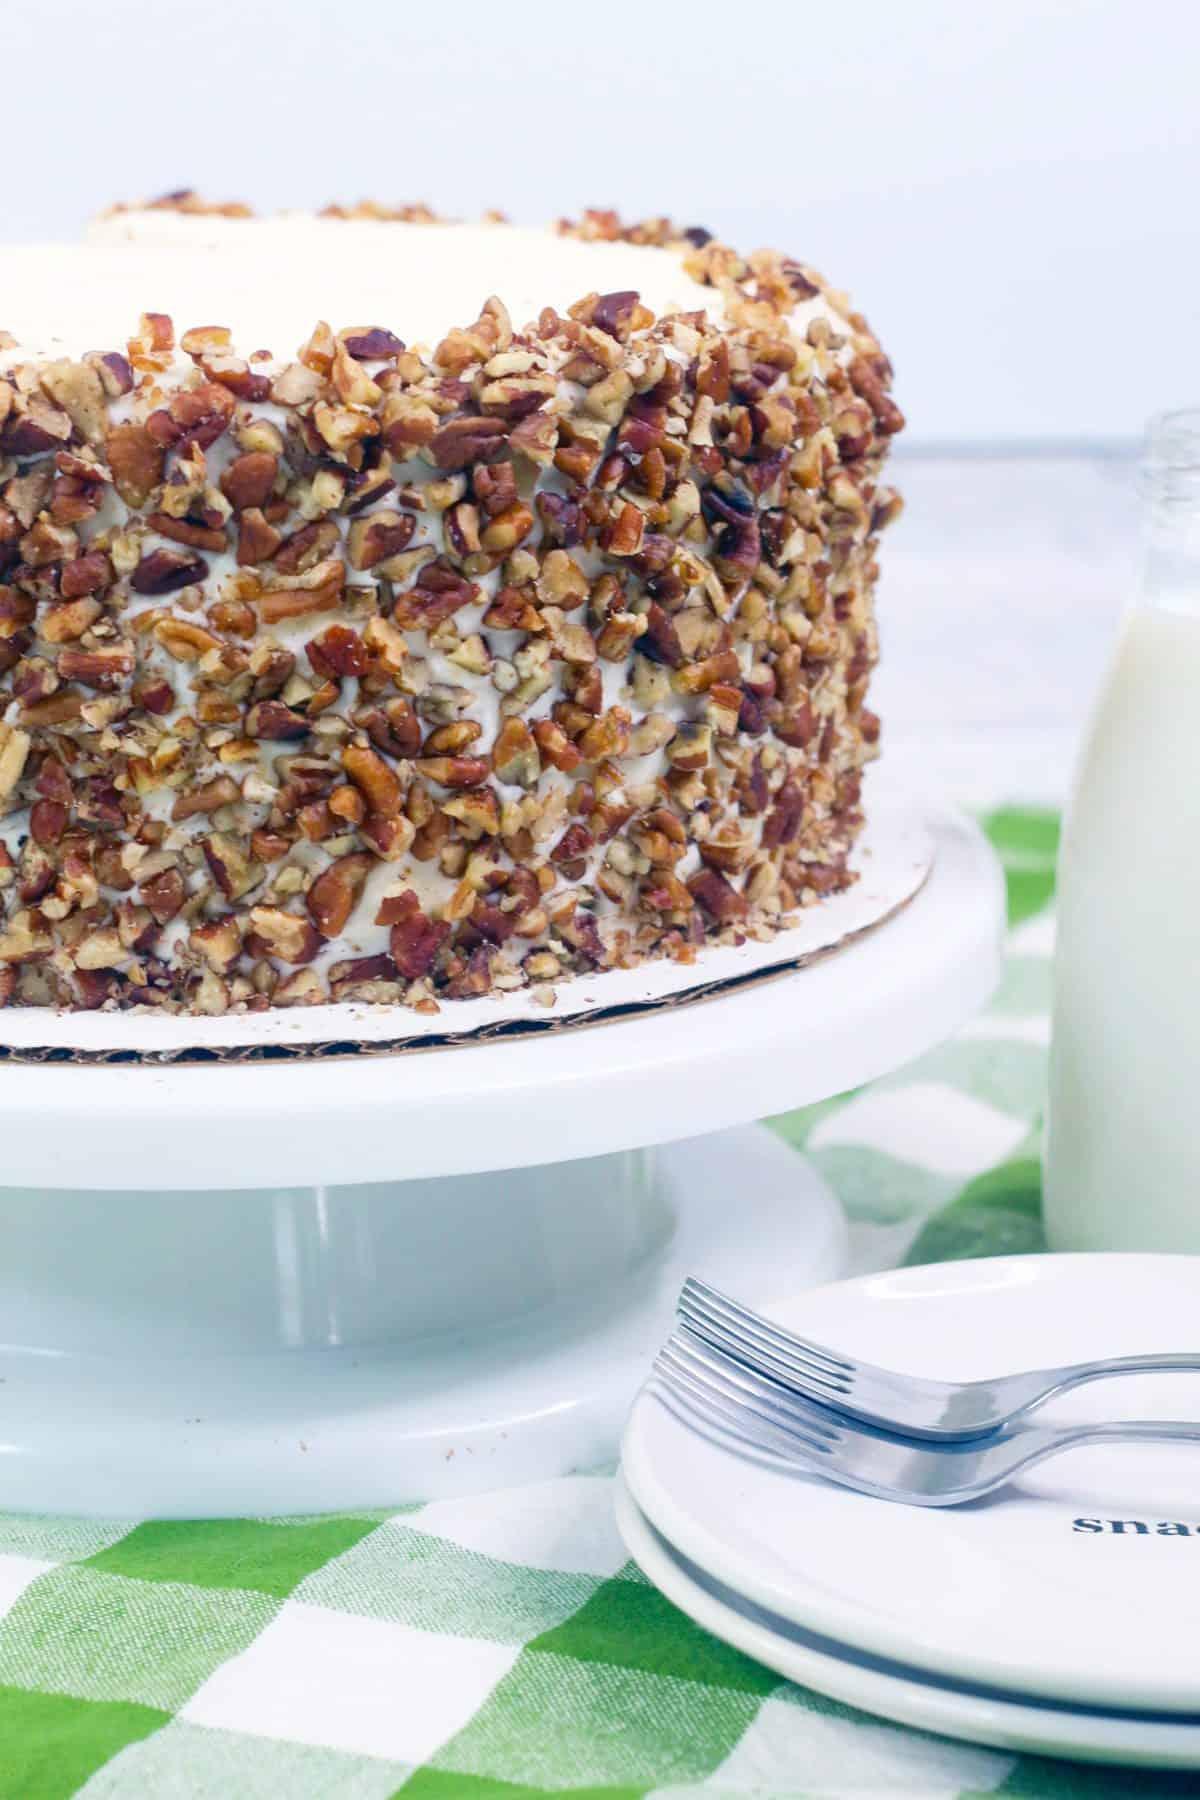 Layered Carrot Cake Recipe, carrot cake